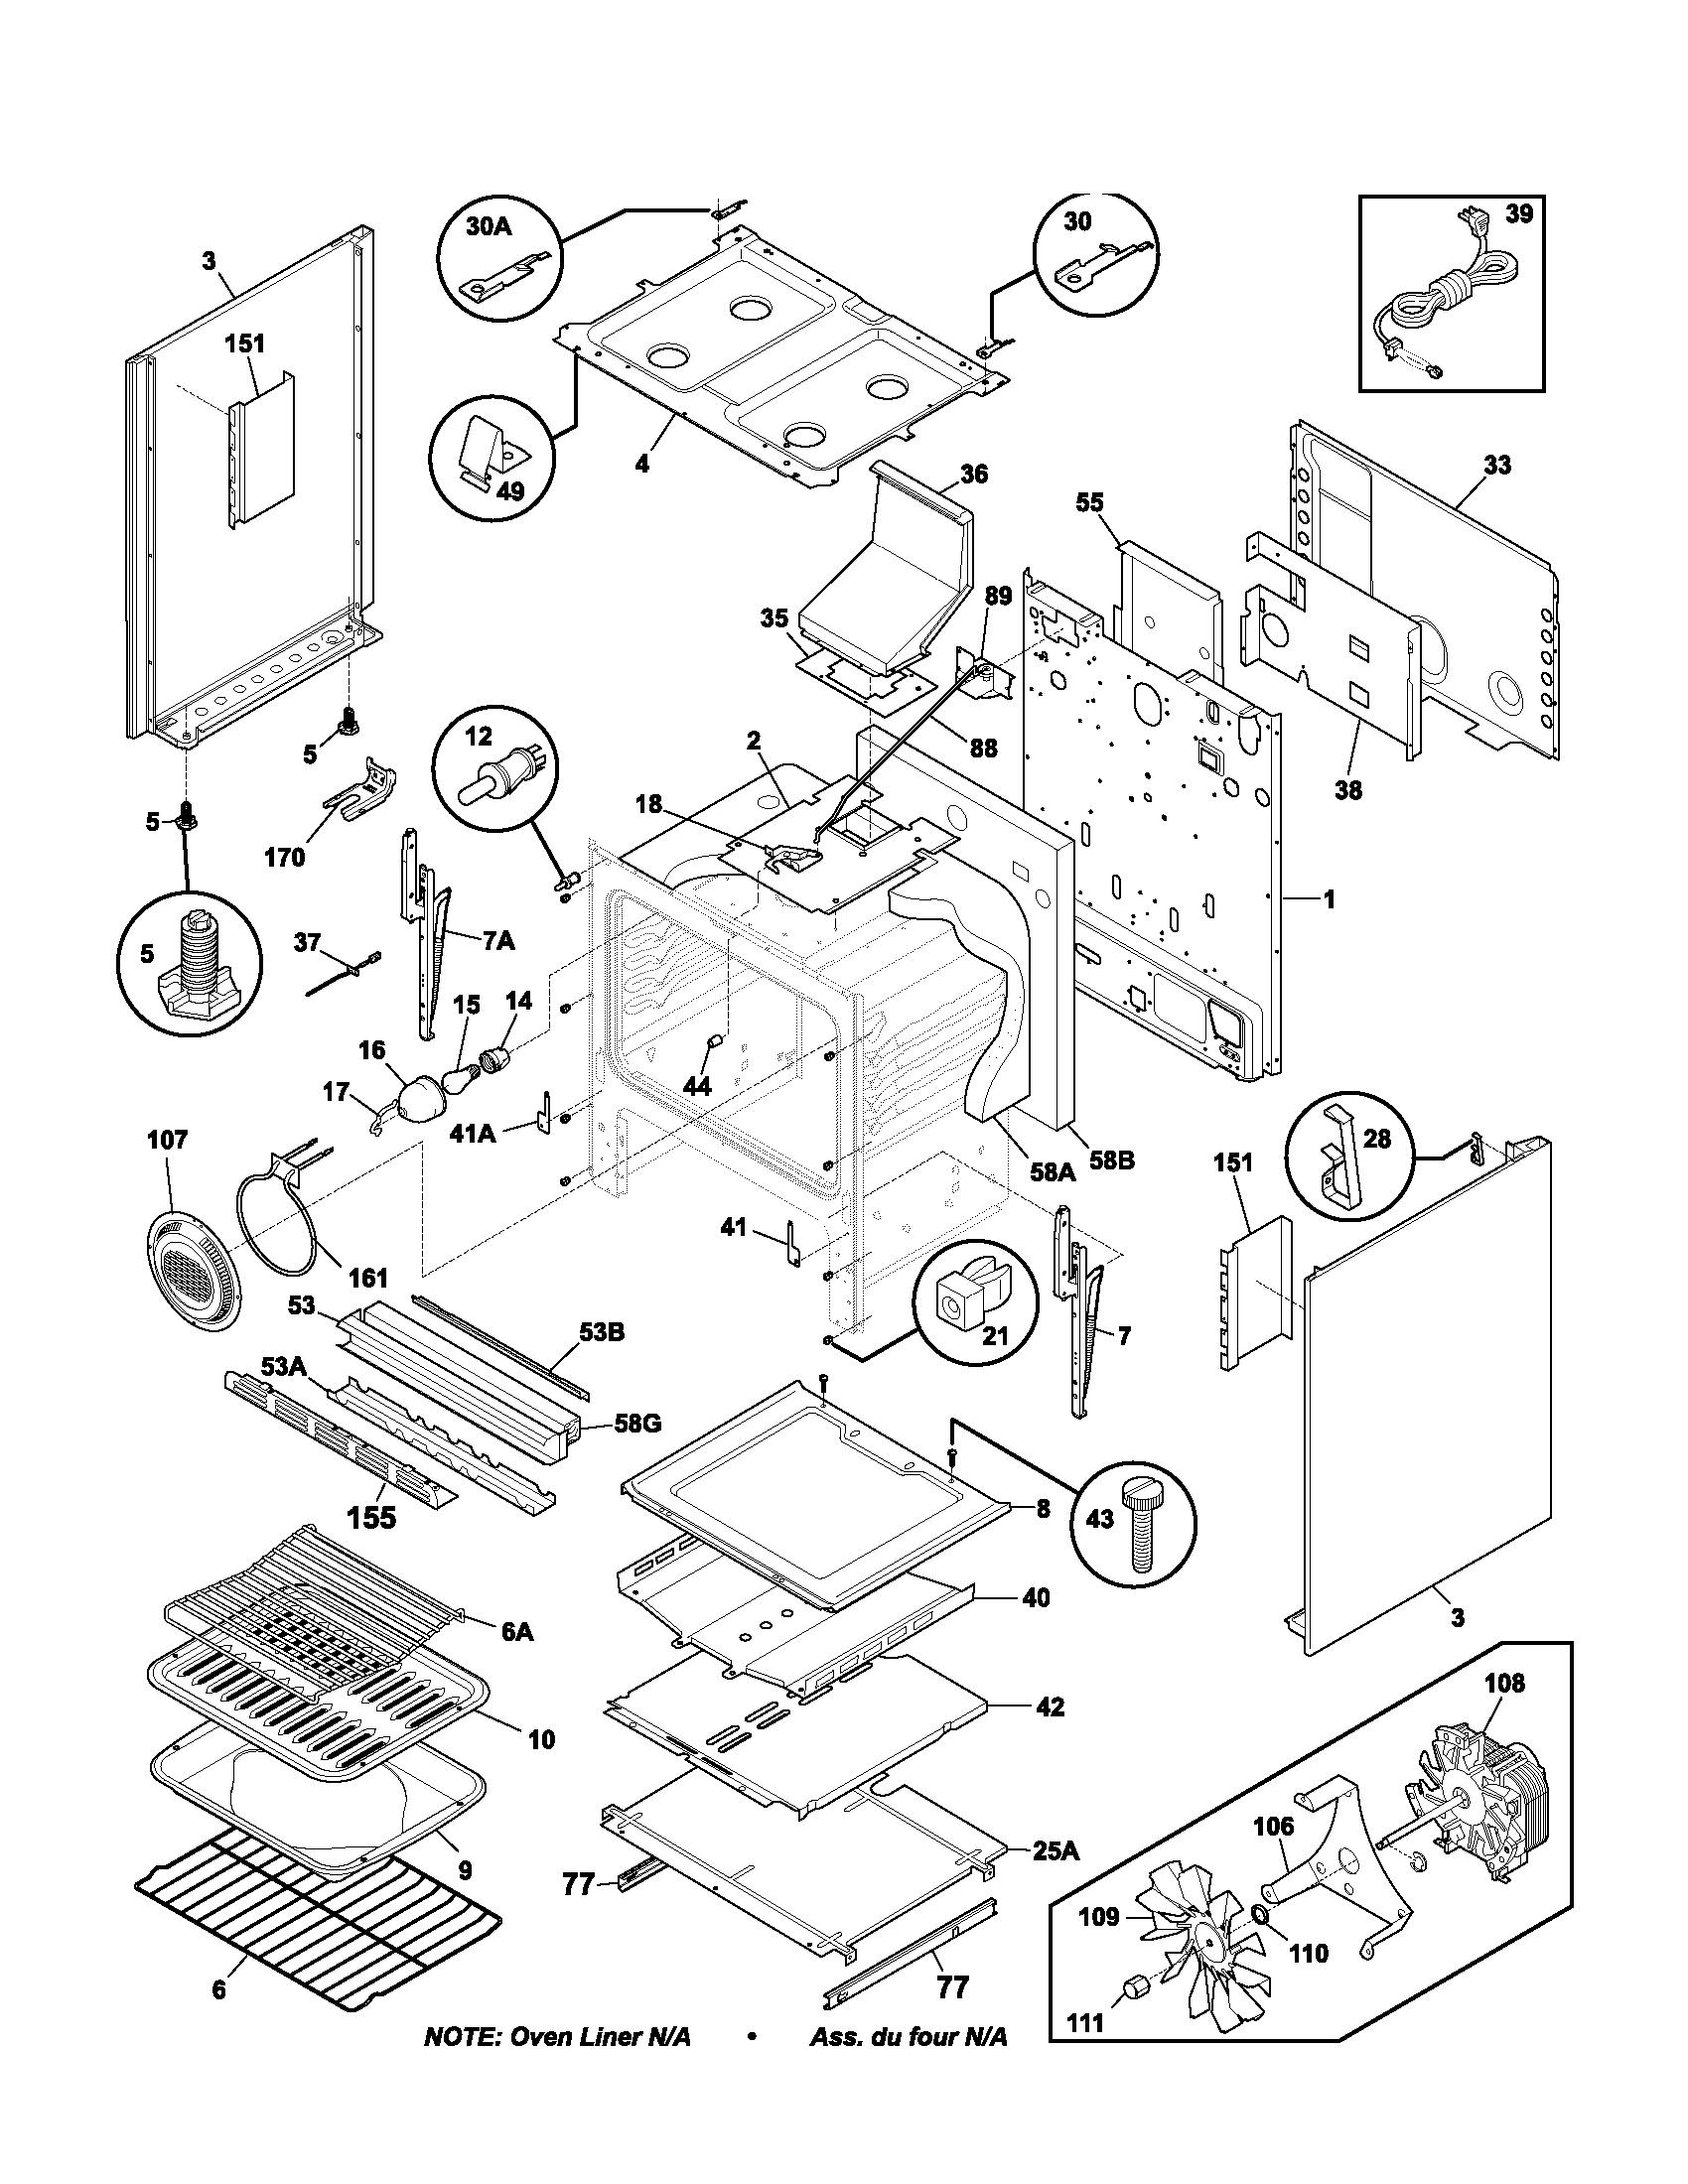 Frigidaire gallery gas dryer parts diagram 1700 x 2200 · 77 kb ·